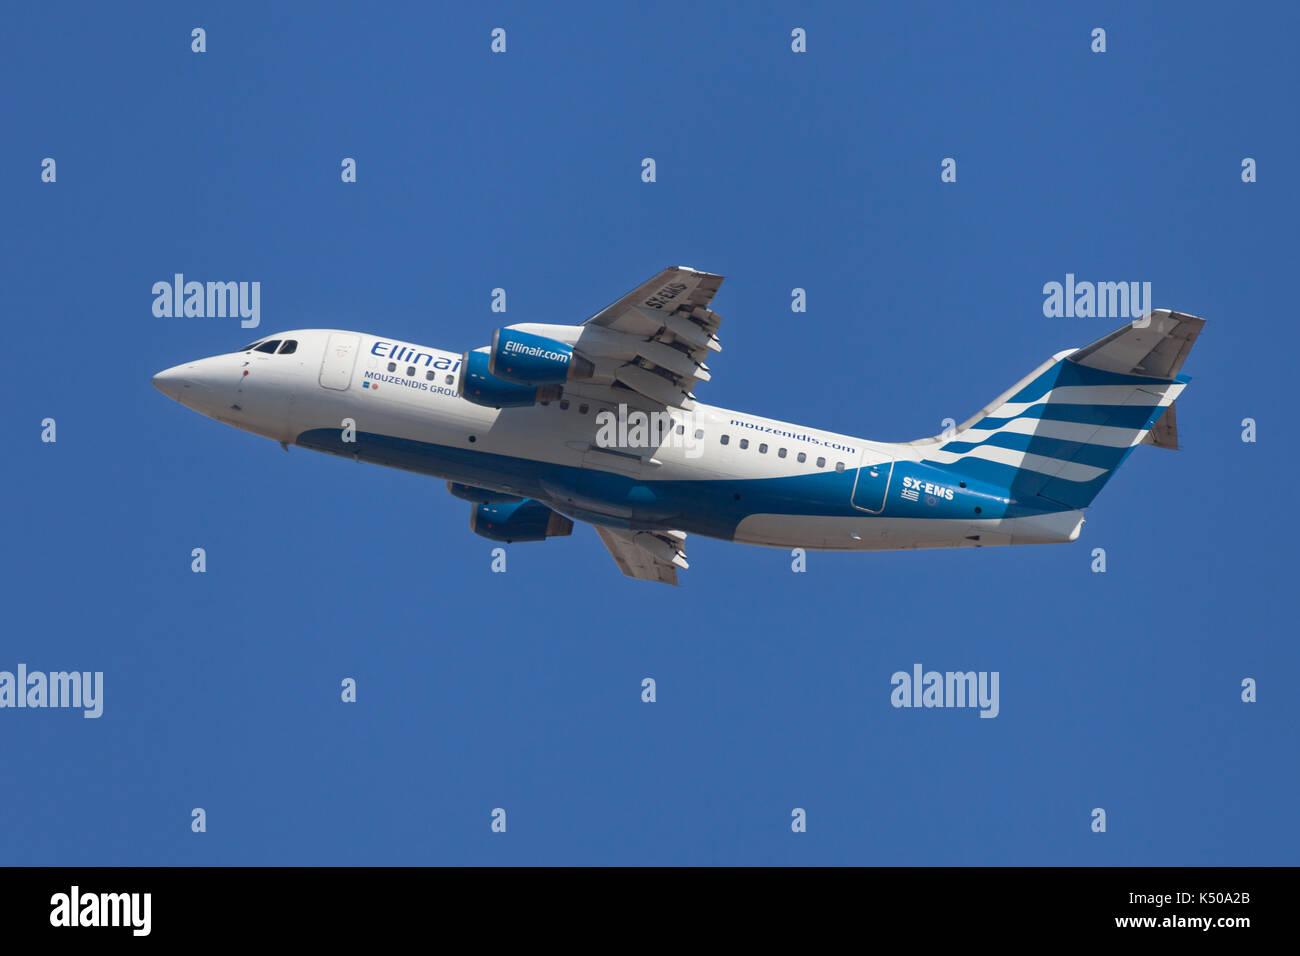 Barcelona, Spain - August 7, 2017: Ellinair British Aerospace Avro RJ85 taking off from El Prat Airport in Barcelona, Spain. - Stock Image